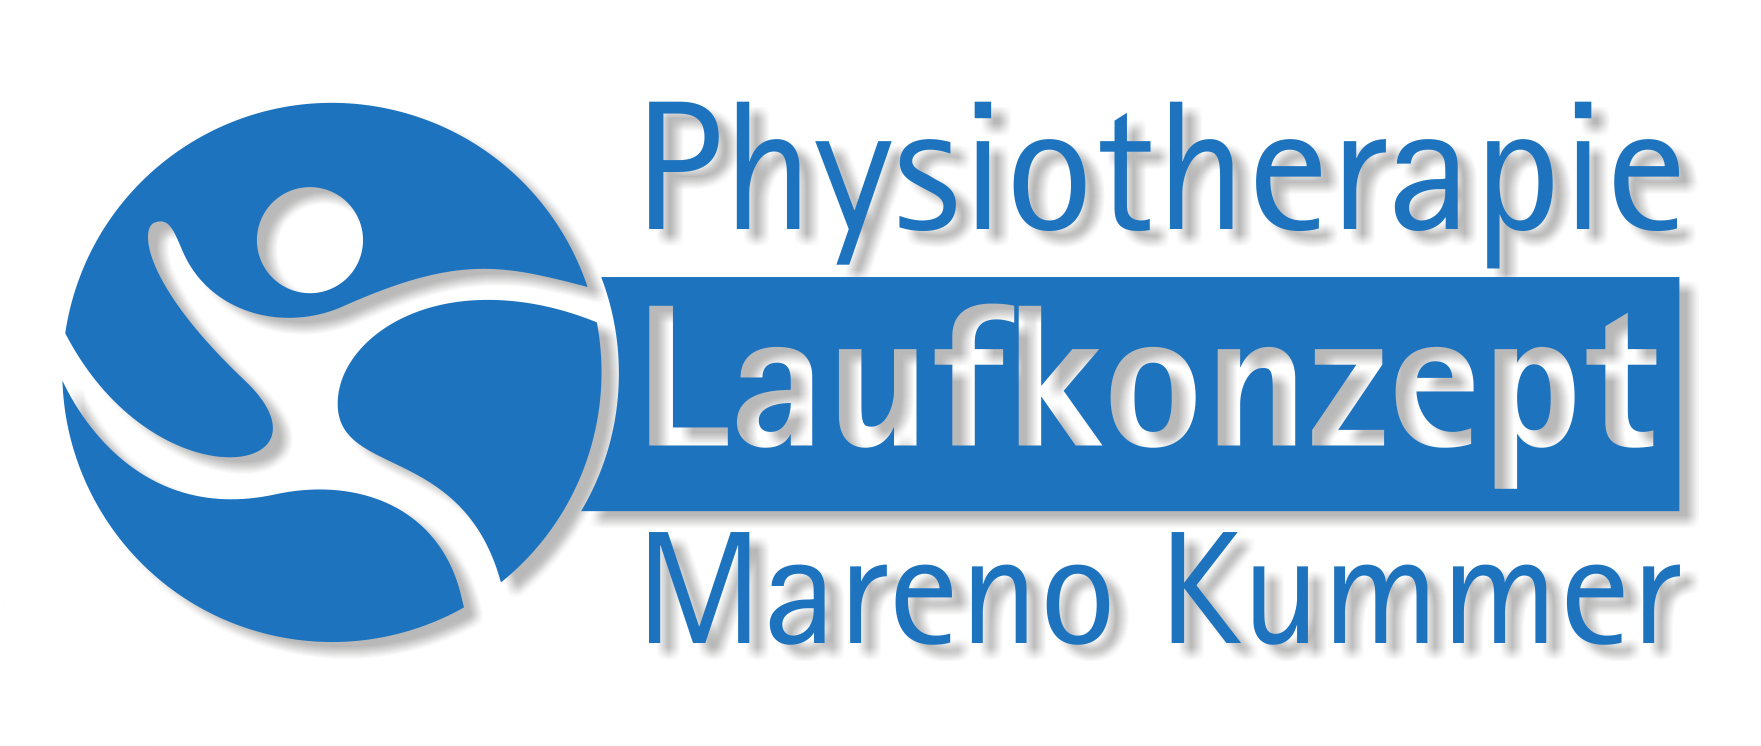 Physiotherapiepraxis Laufkonzept